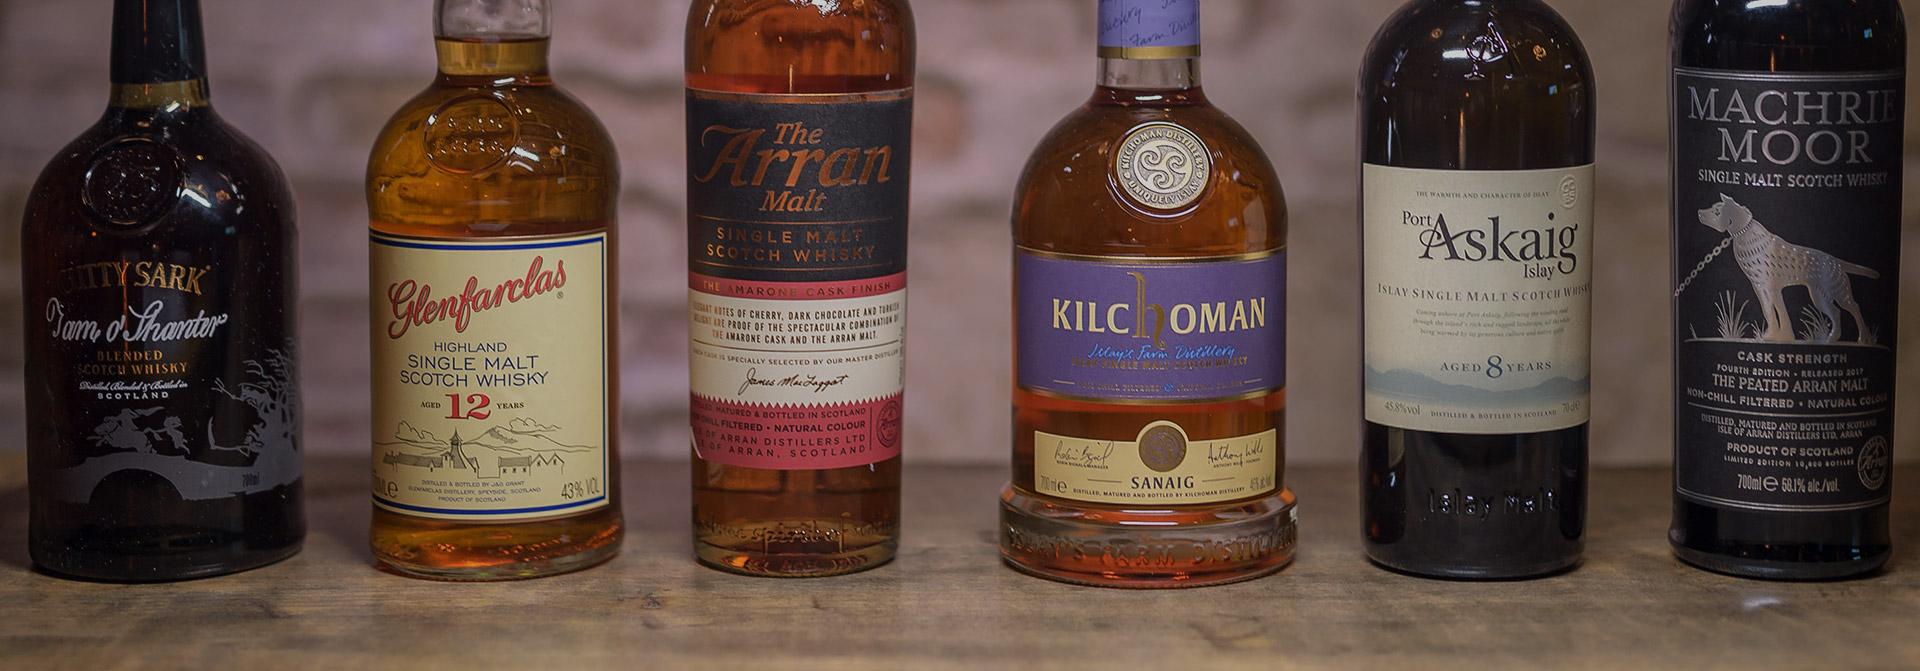 robert burns night 2019 the tasters club whisky tasting